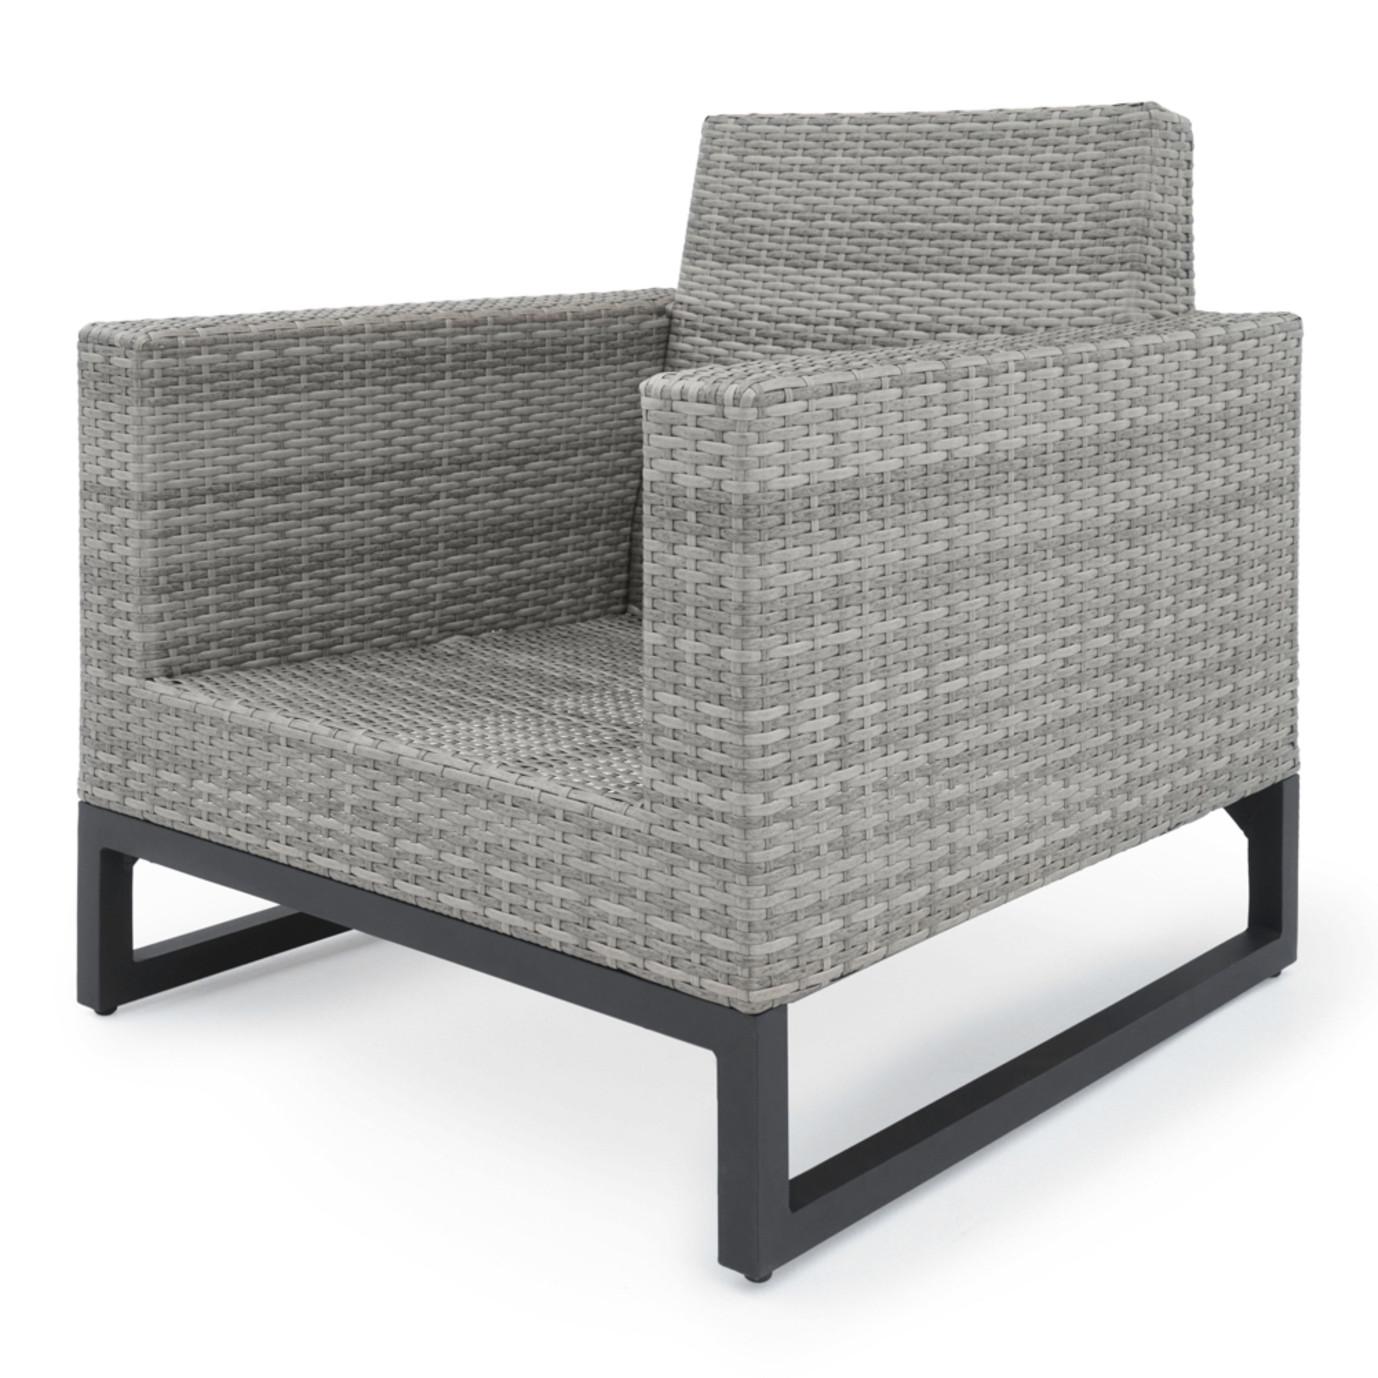 Milo™ Gray Club Chairs - Maxim Beige